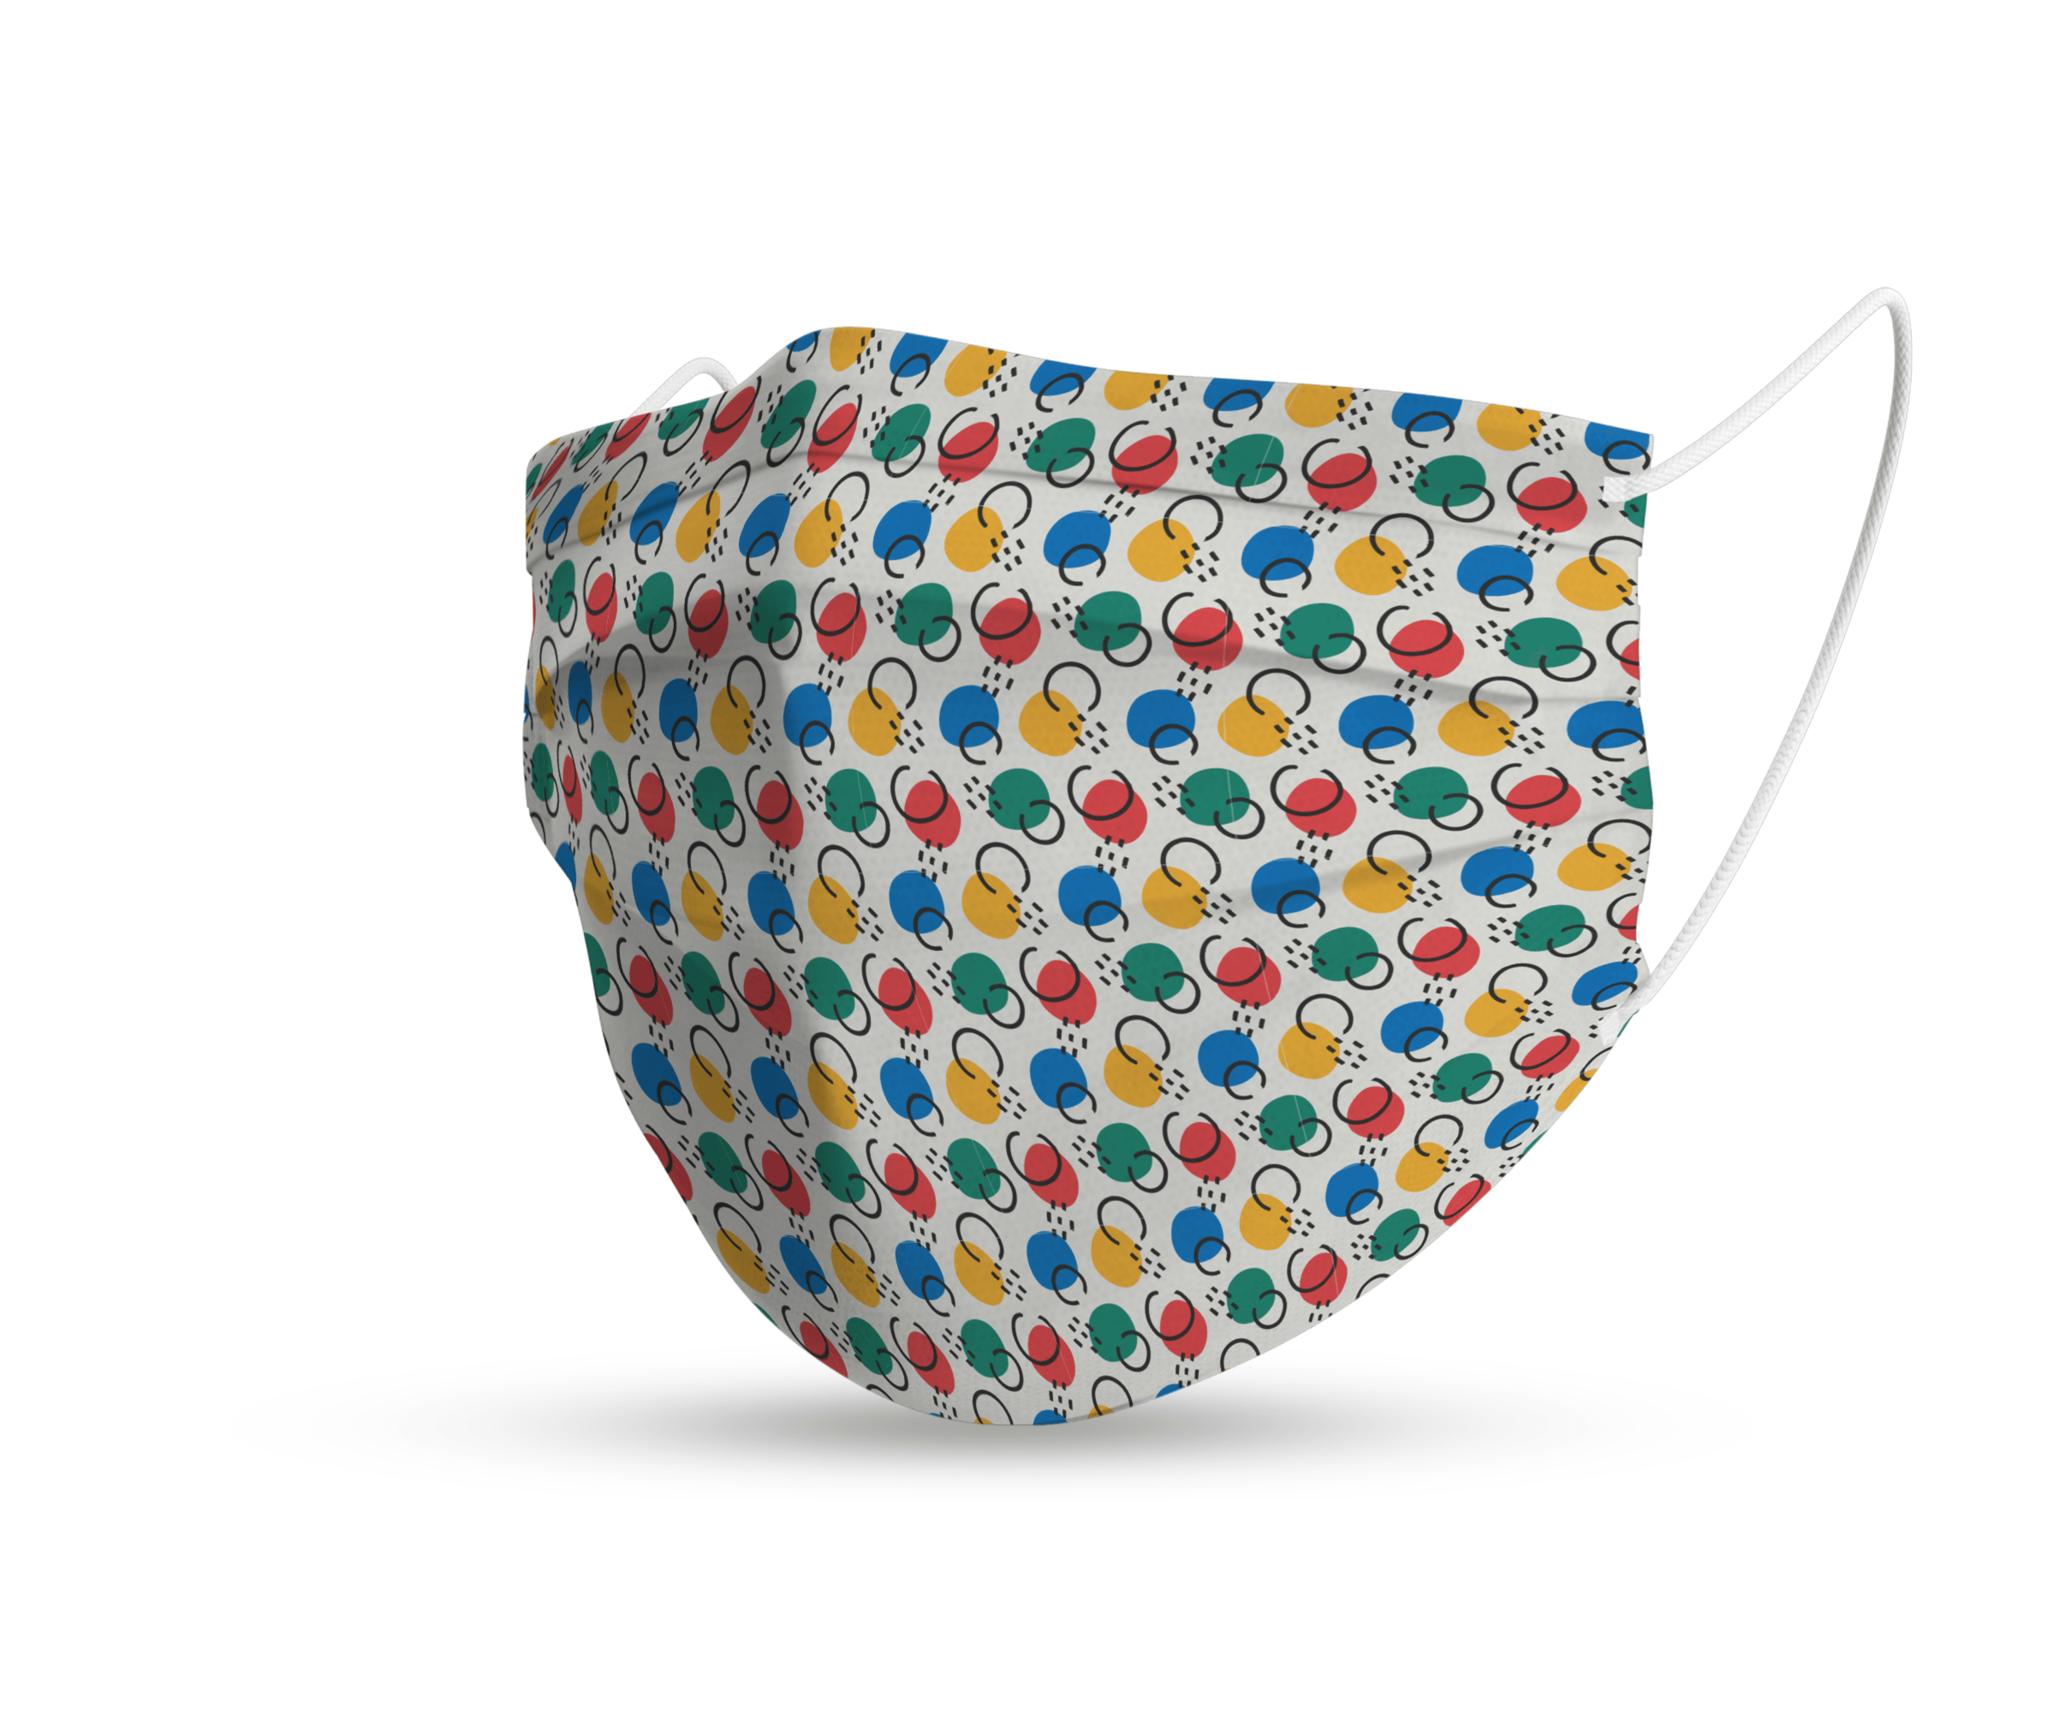 Topfanz Mondmasker trendy lijntjes en bolletjes